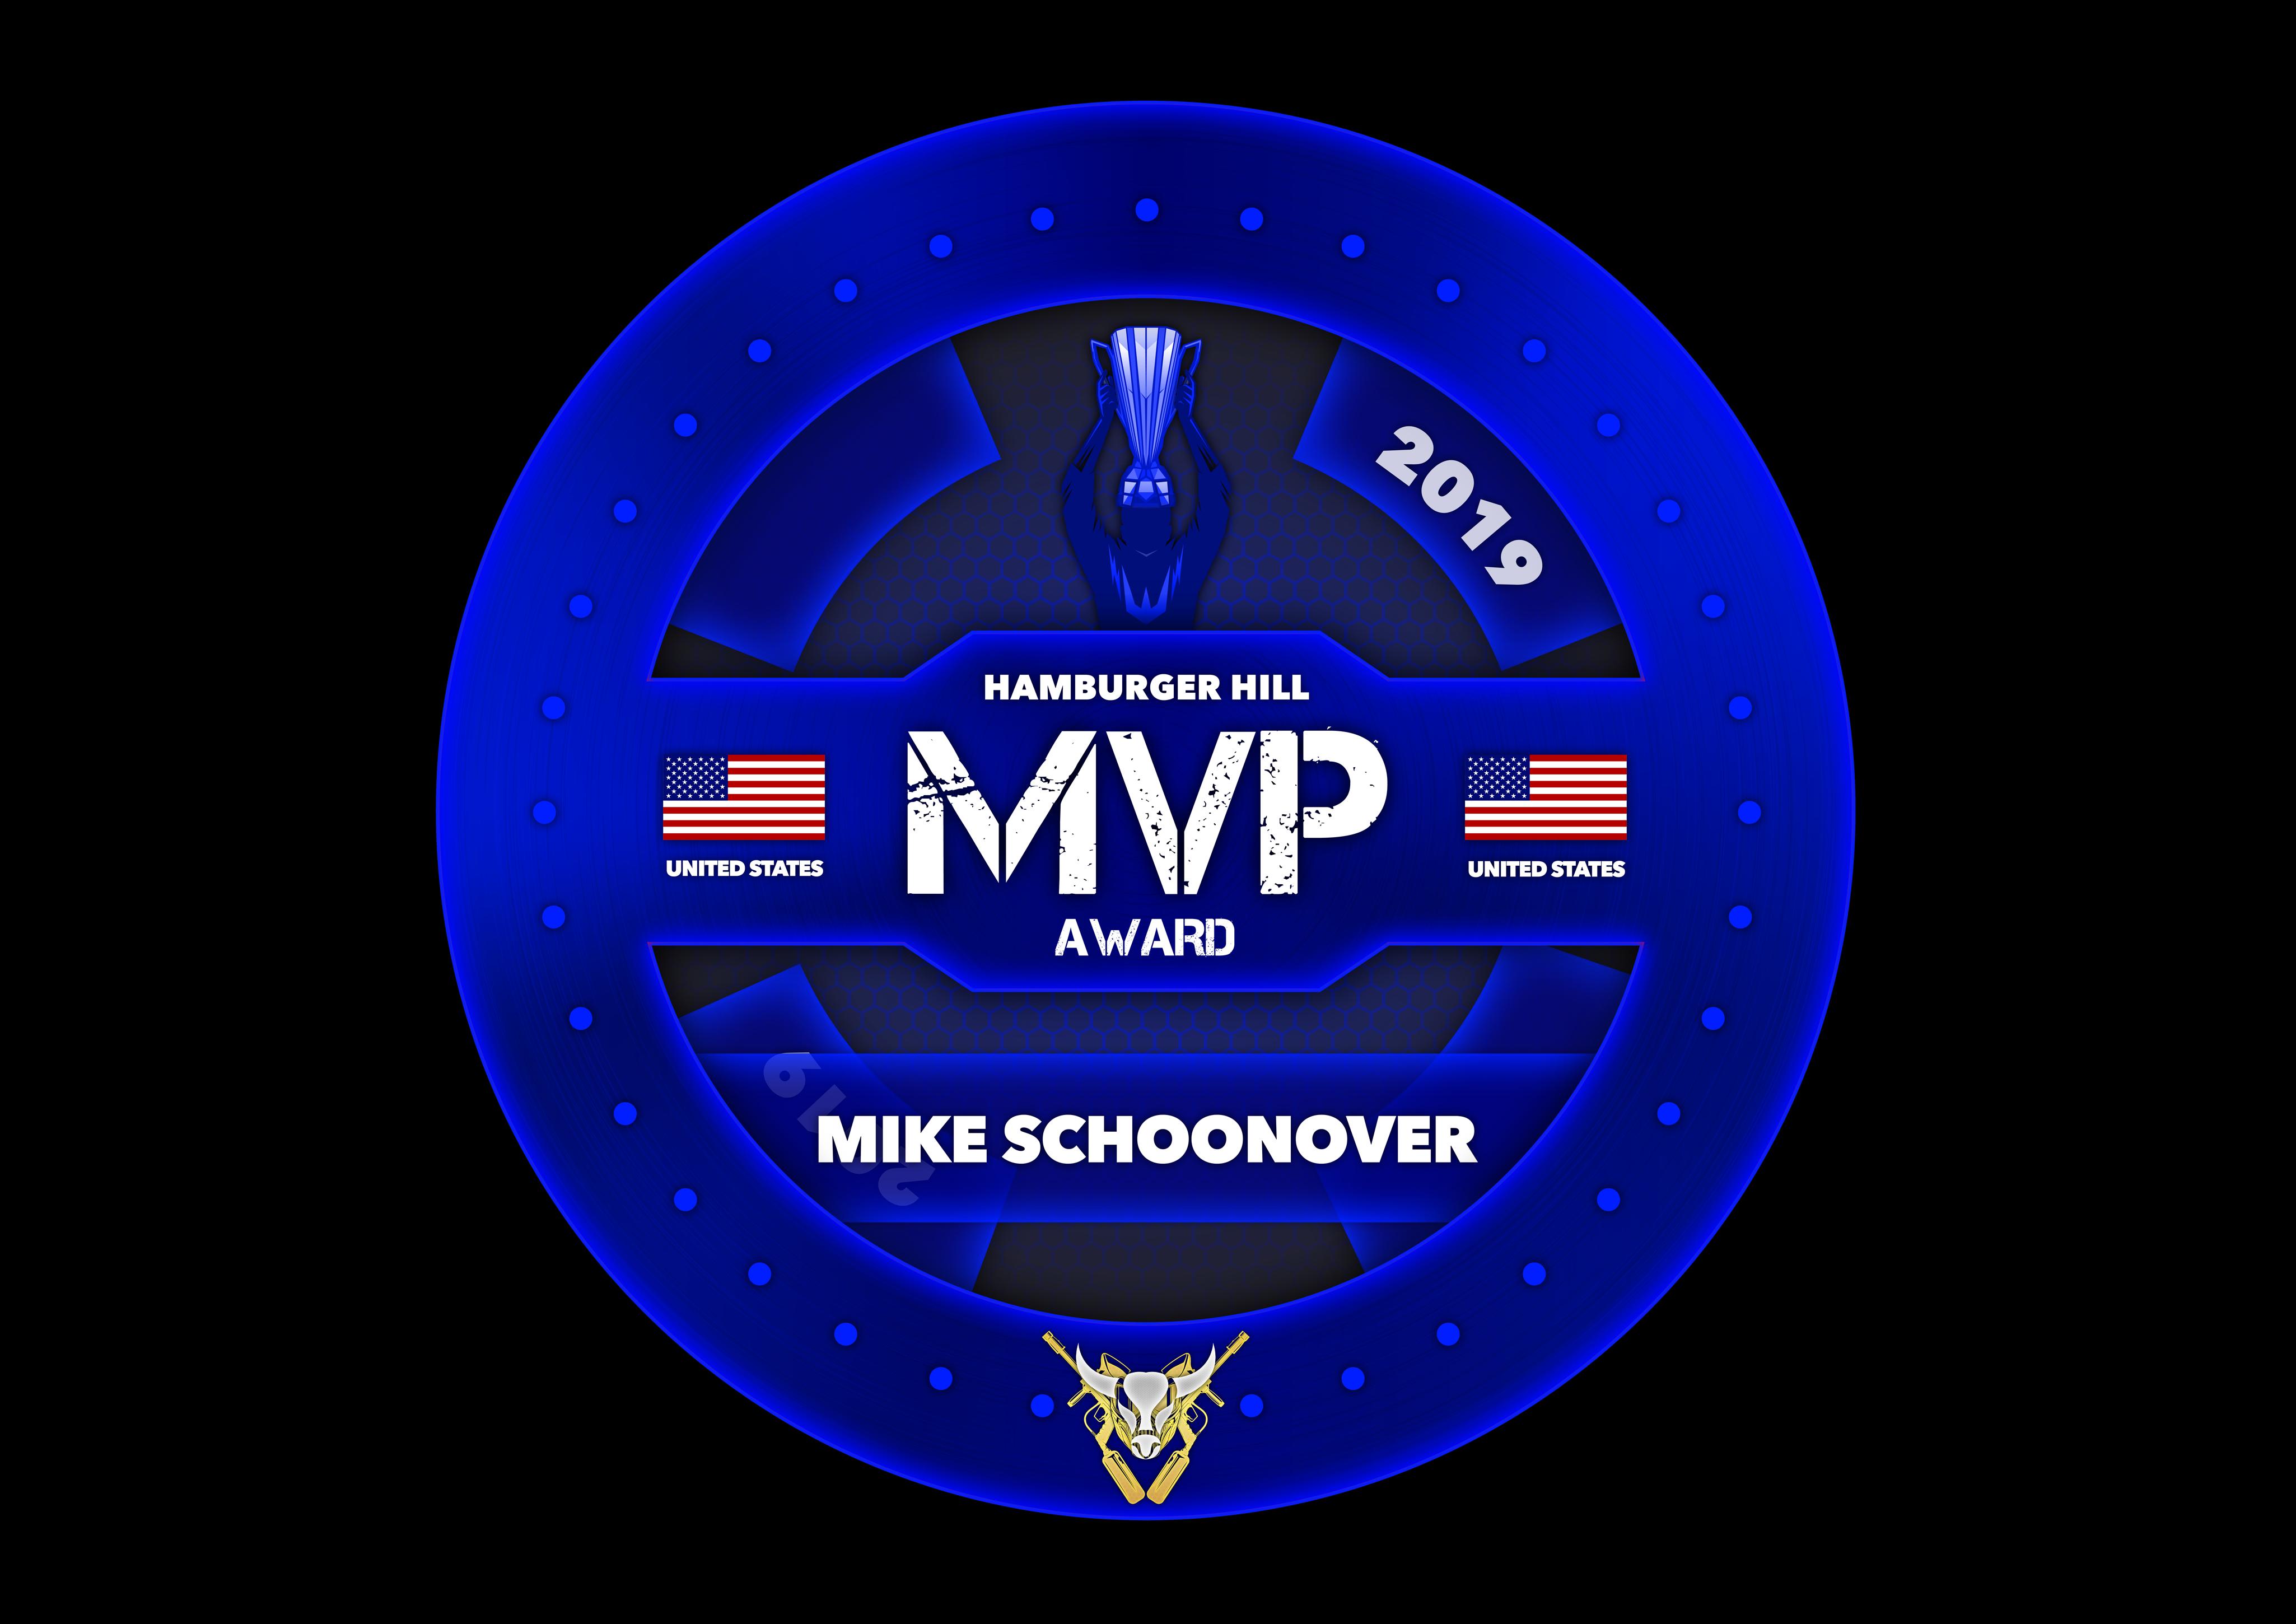 United States MVP